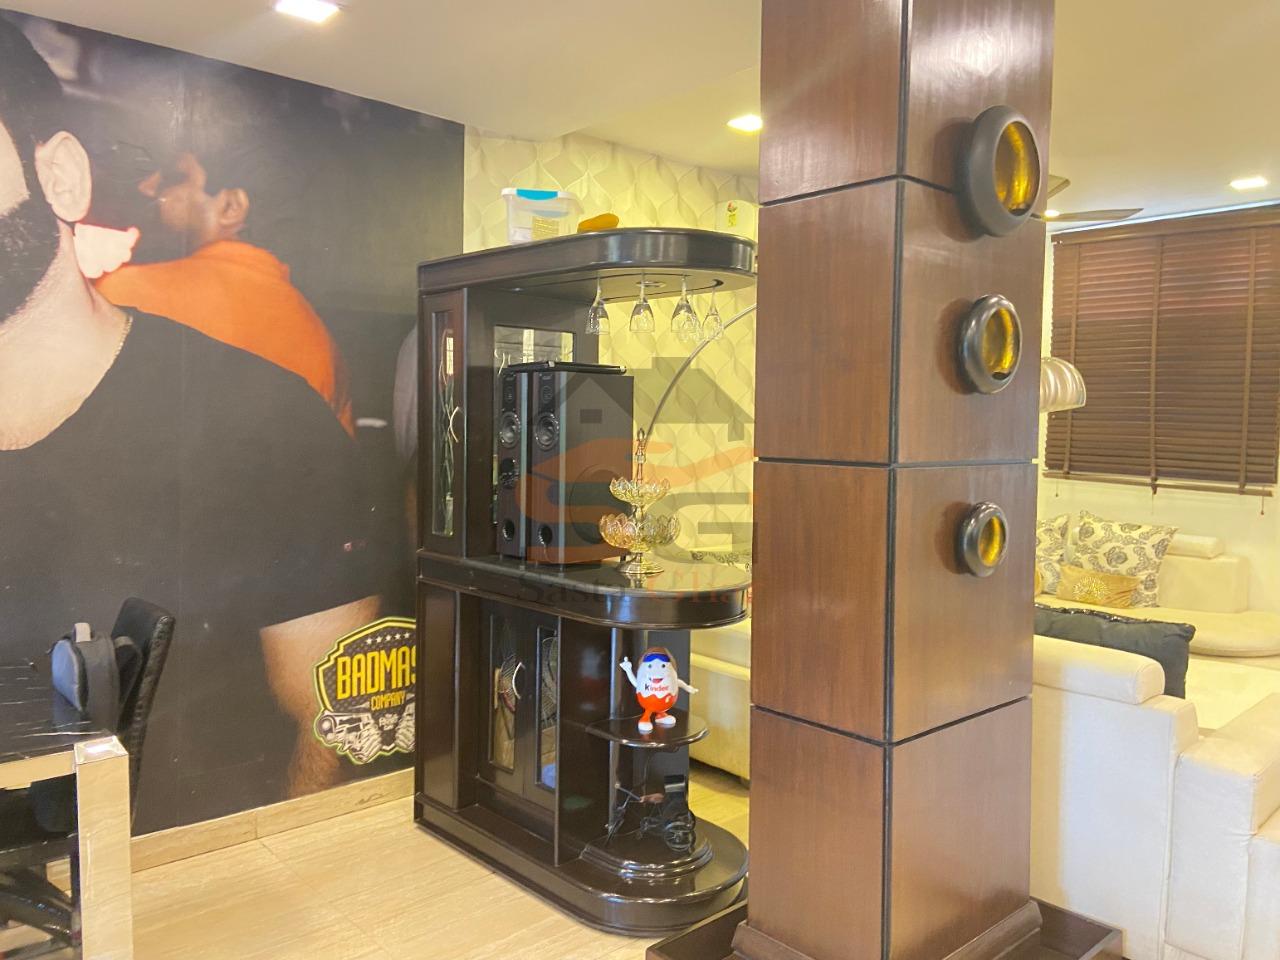 Luxurious 3 BHK flats in Vasant Kunj